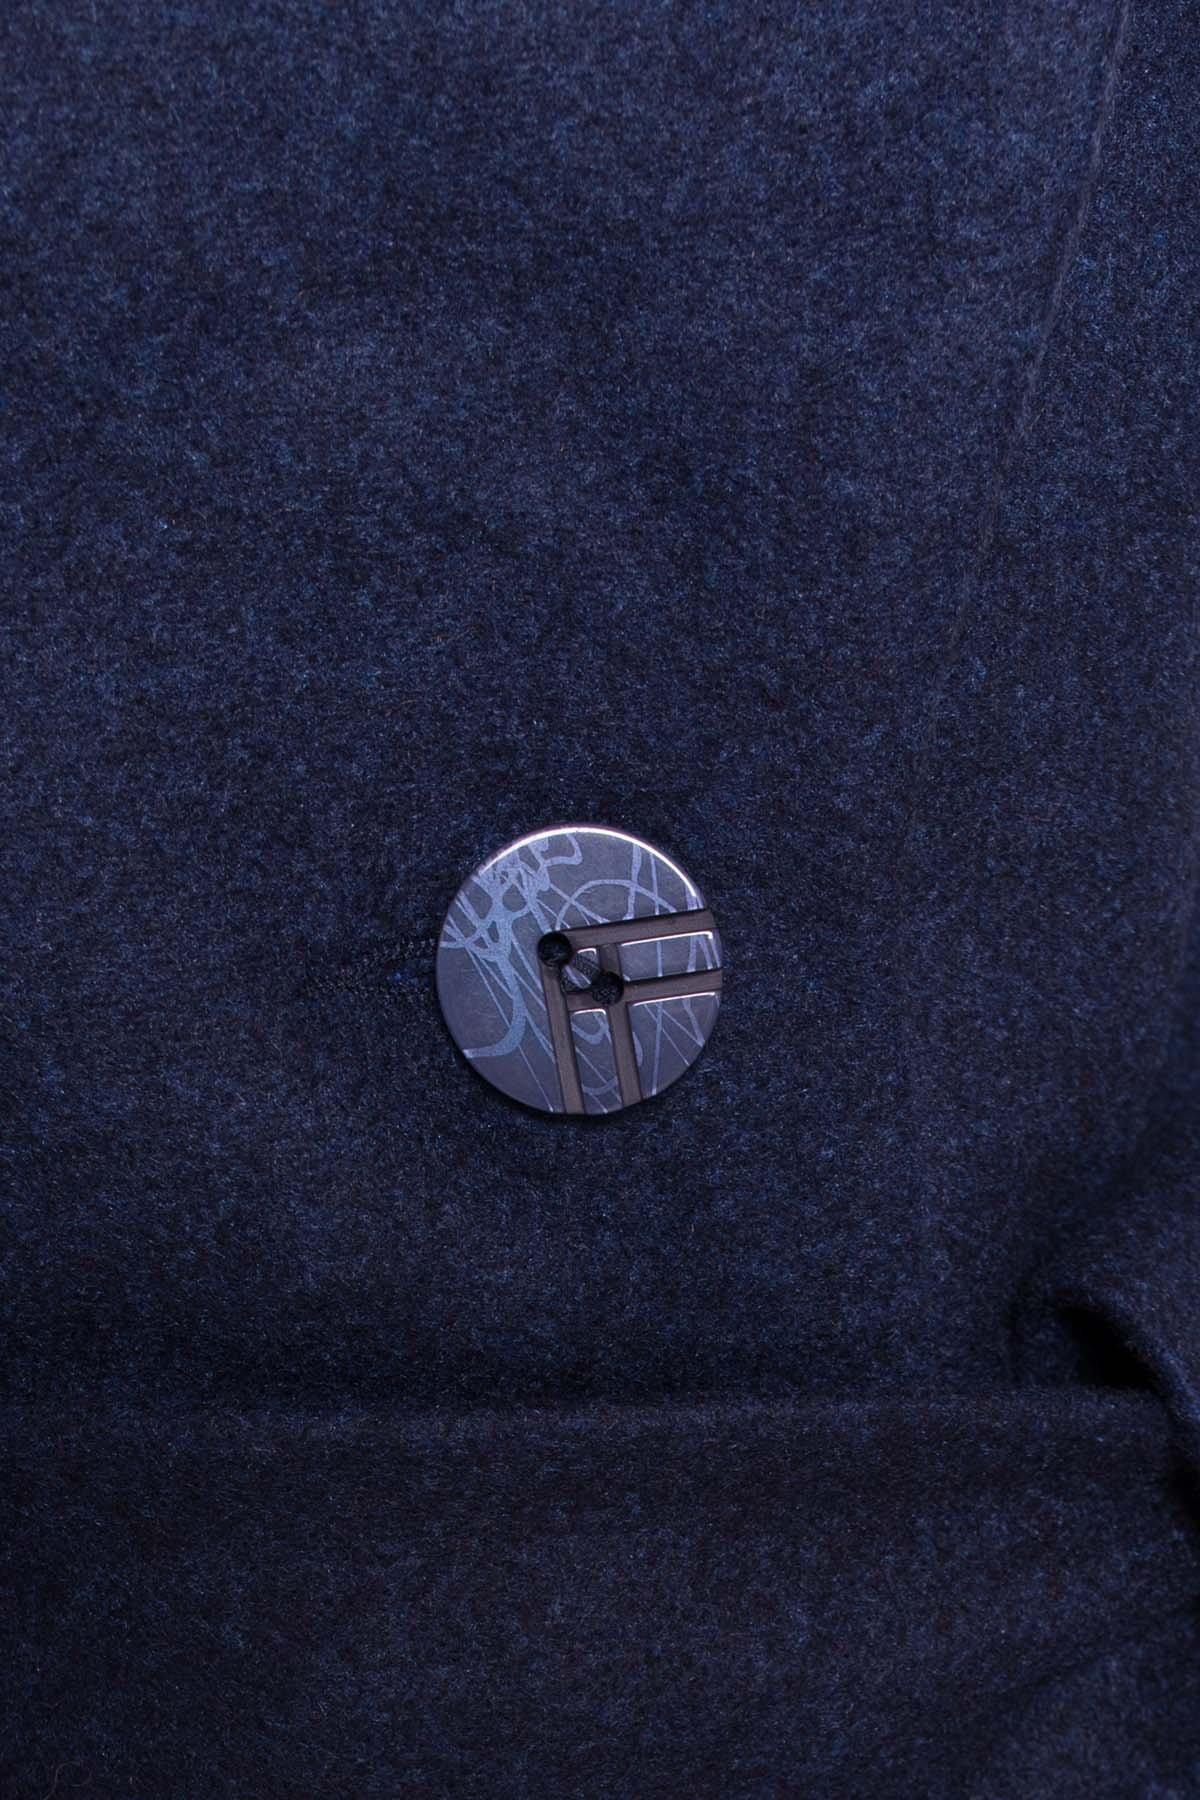 Пальто на весну-осень Габриэлла 4459 АРТ. 36662 Цвет: Темно-синий 17 - фото 6, интернет магазин tm-modus.ru